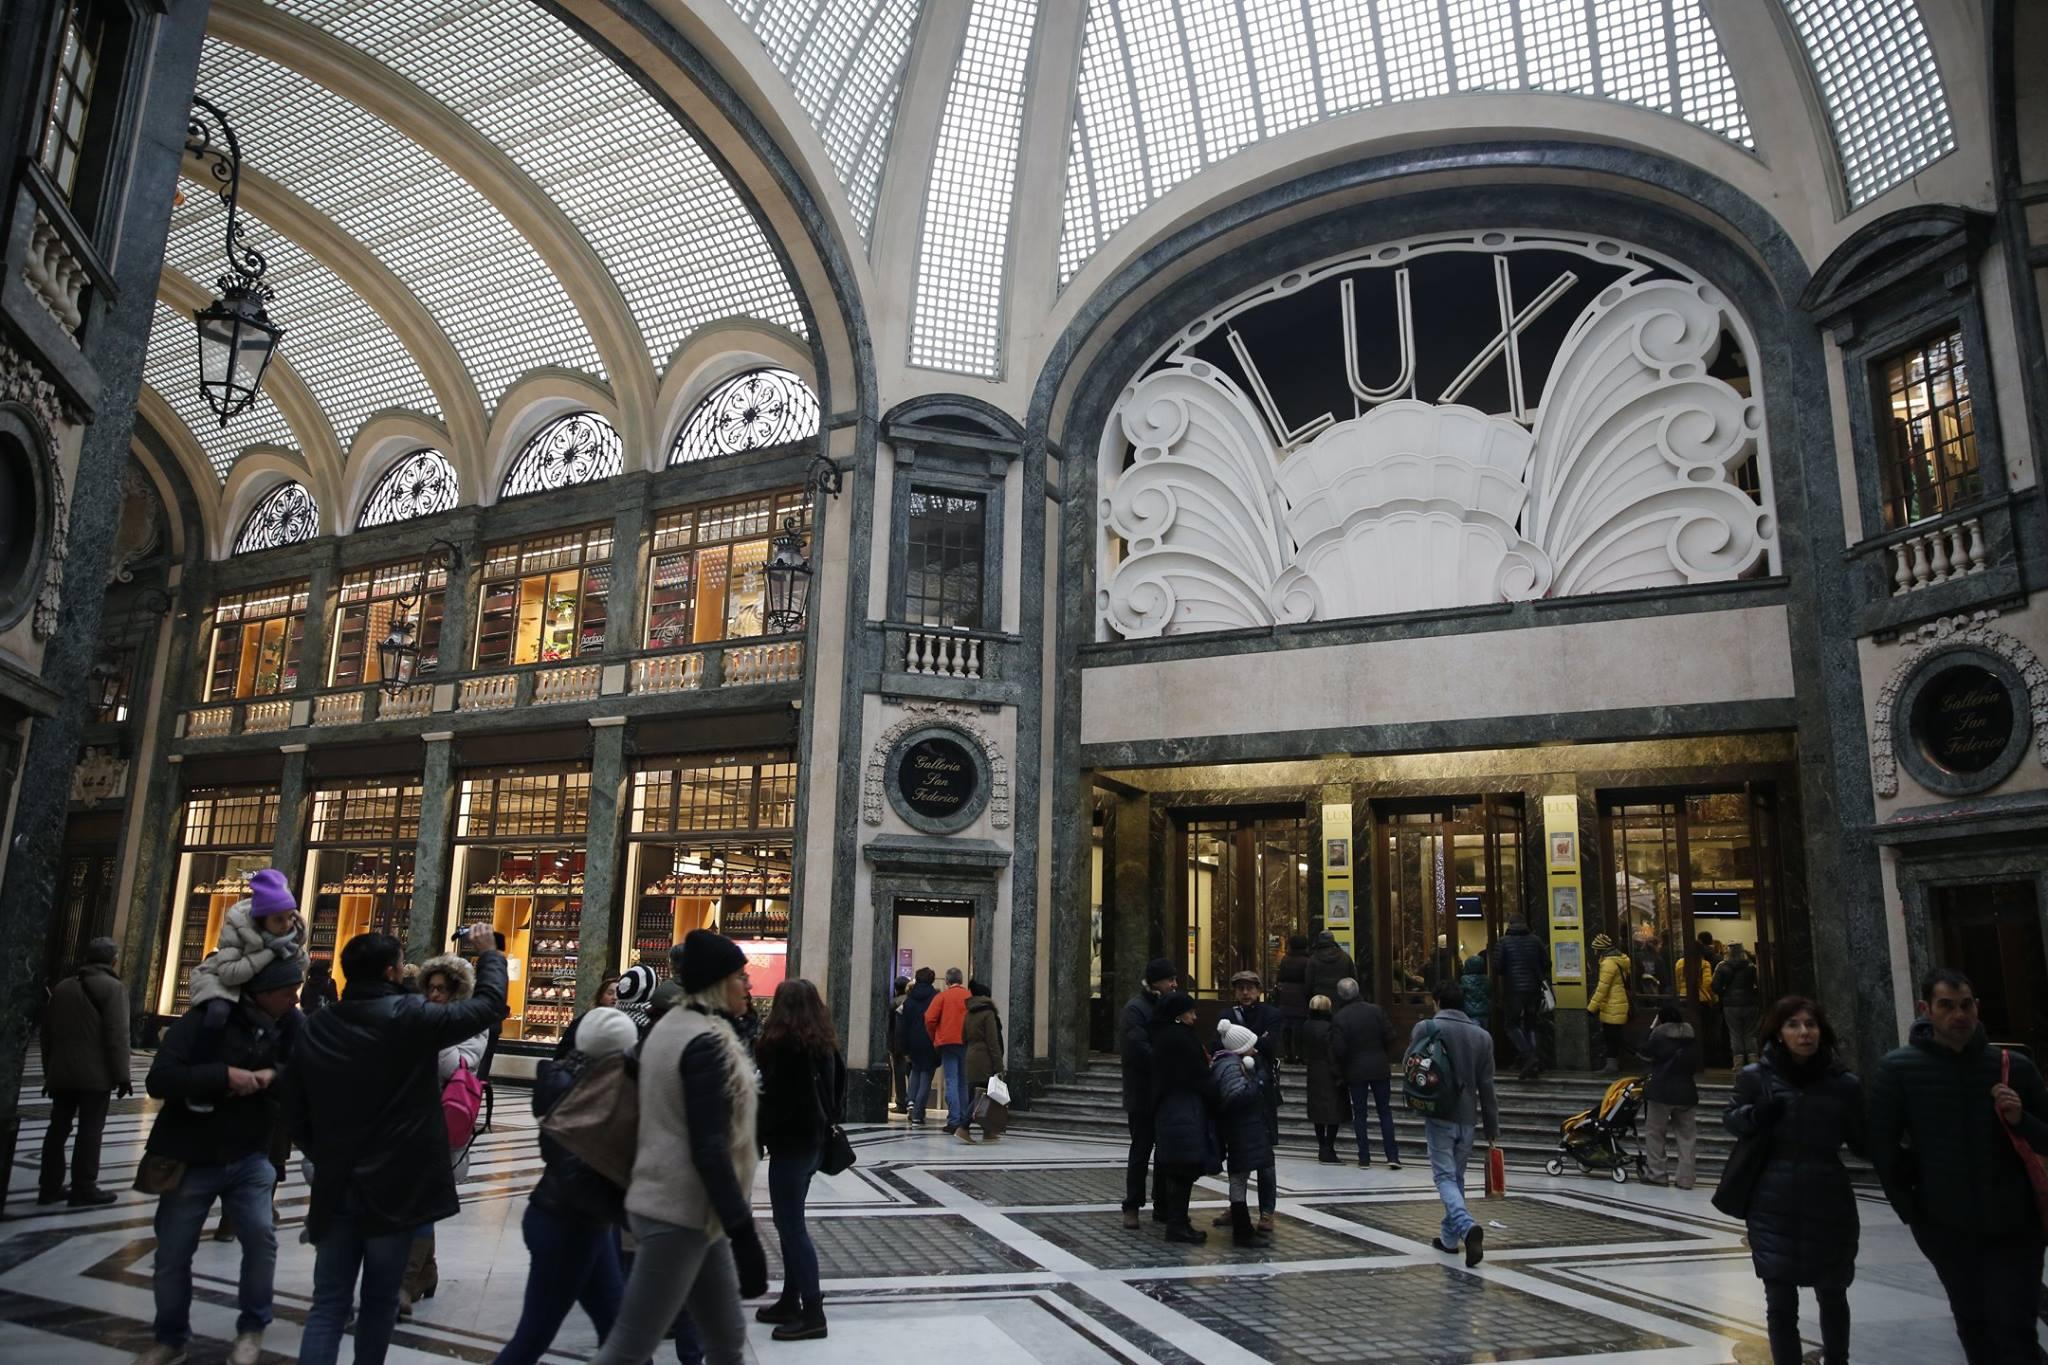 La Credenza Galleria San Federico : Fiorfood si rinnova la galleria san federico mole